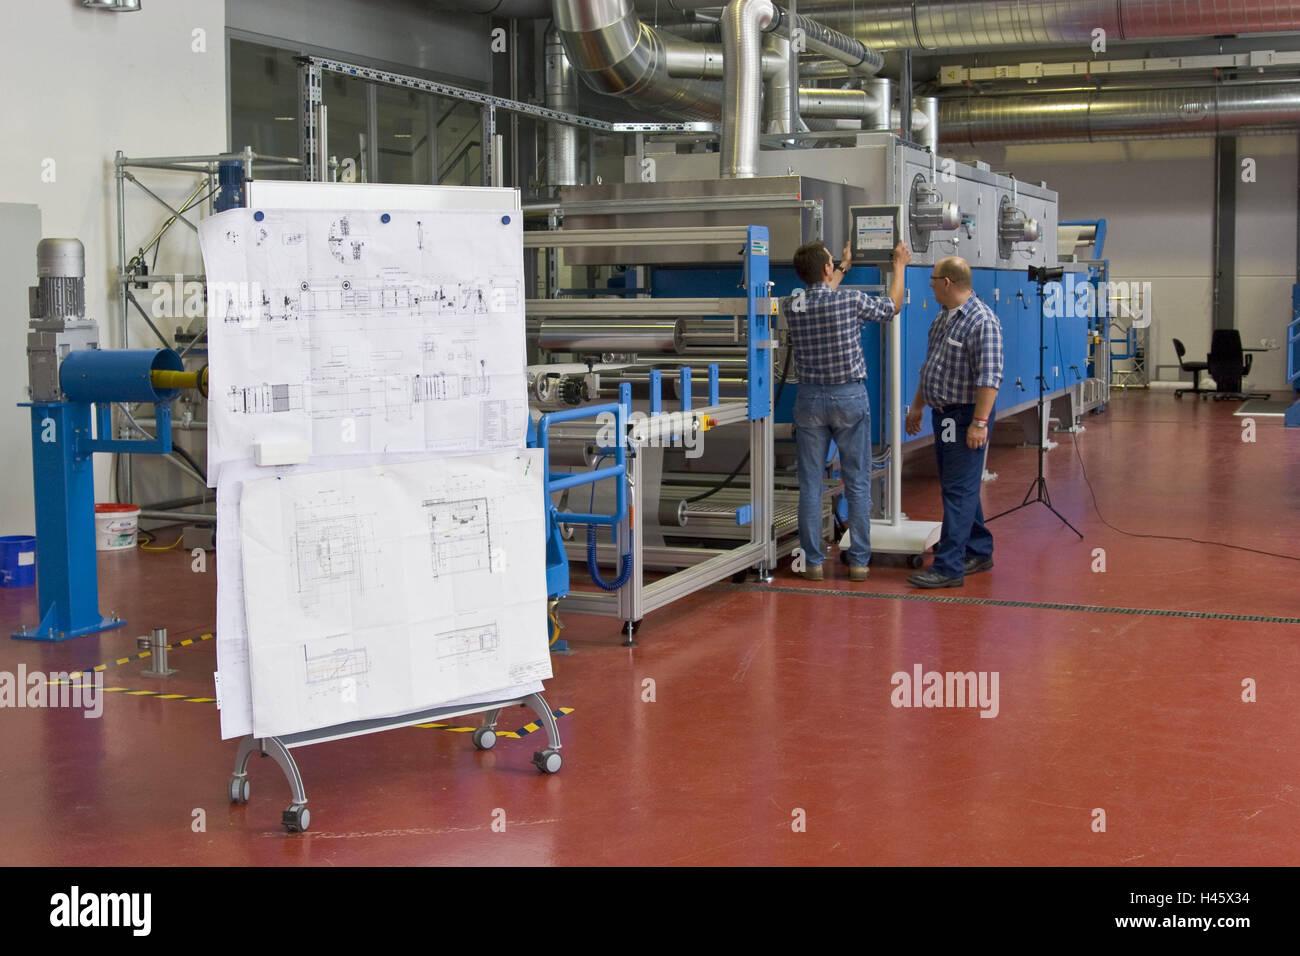 Chemicals companies, men, two, machine, controls, Germany, North Rhine-Westphalia, Marl, Evonik, company, nanotechnology, - Stock Image